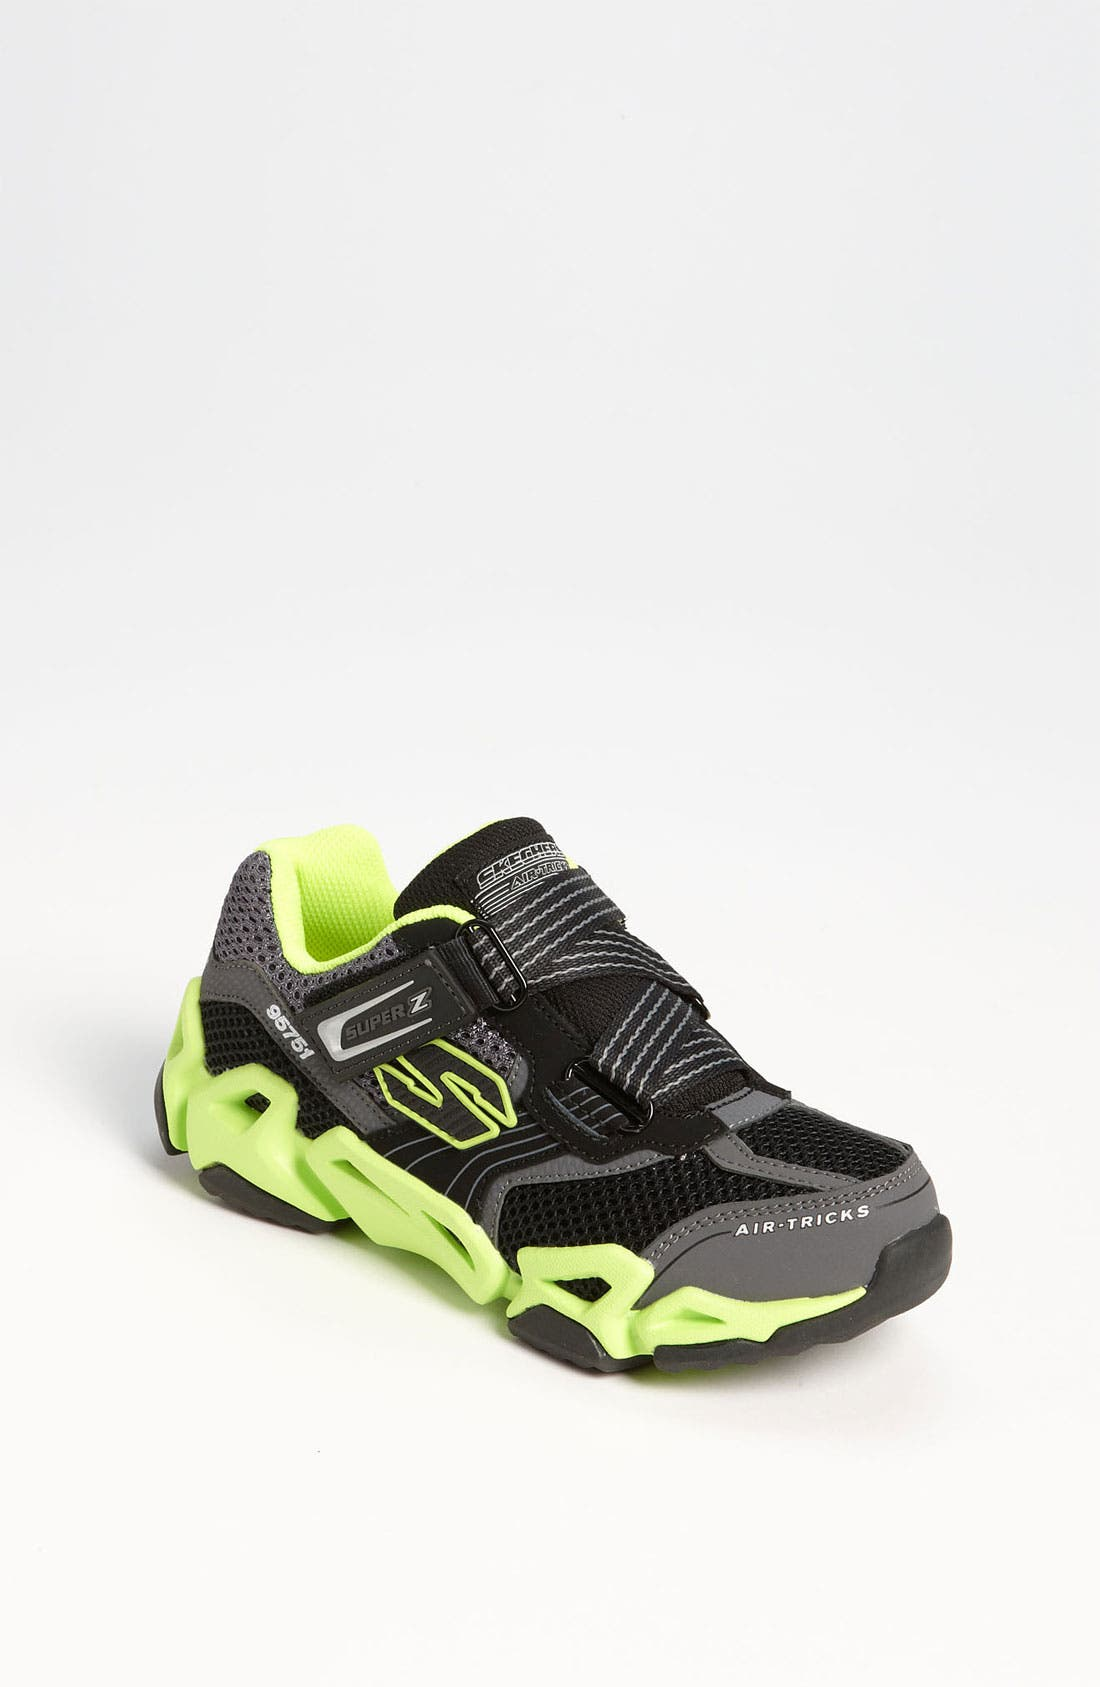 Alternate Image 1 Selected - SKECHERS 'Fierce Flex' Sneaker (Walker, Toddler, Little Kid & Big Kid)